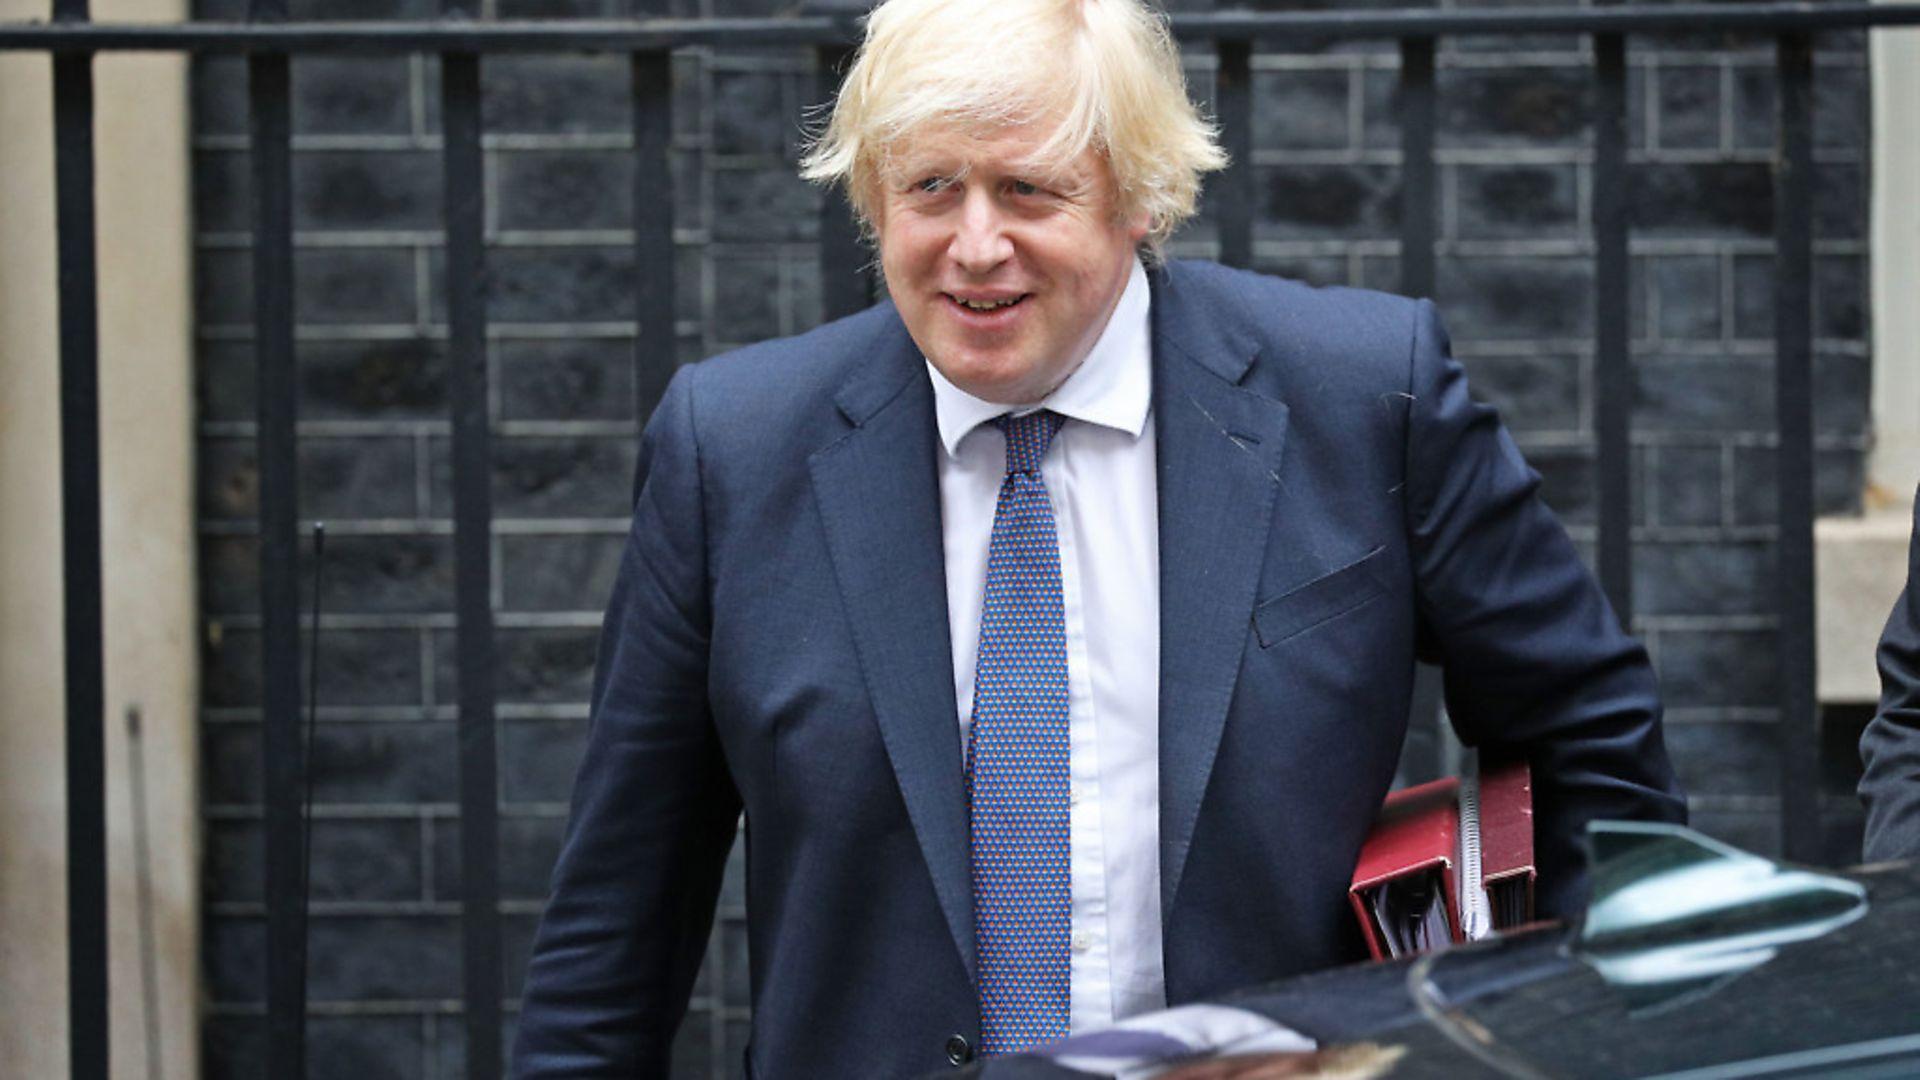 Prime minister Boris Johnson departs 10 Downing Street; Jonathan Brady/PA Wire - Credit: PA